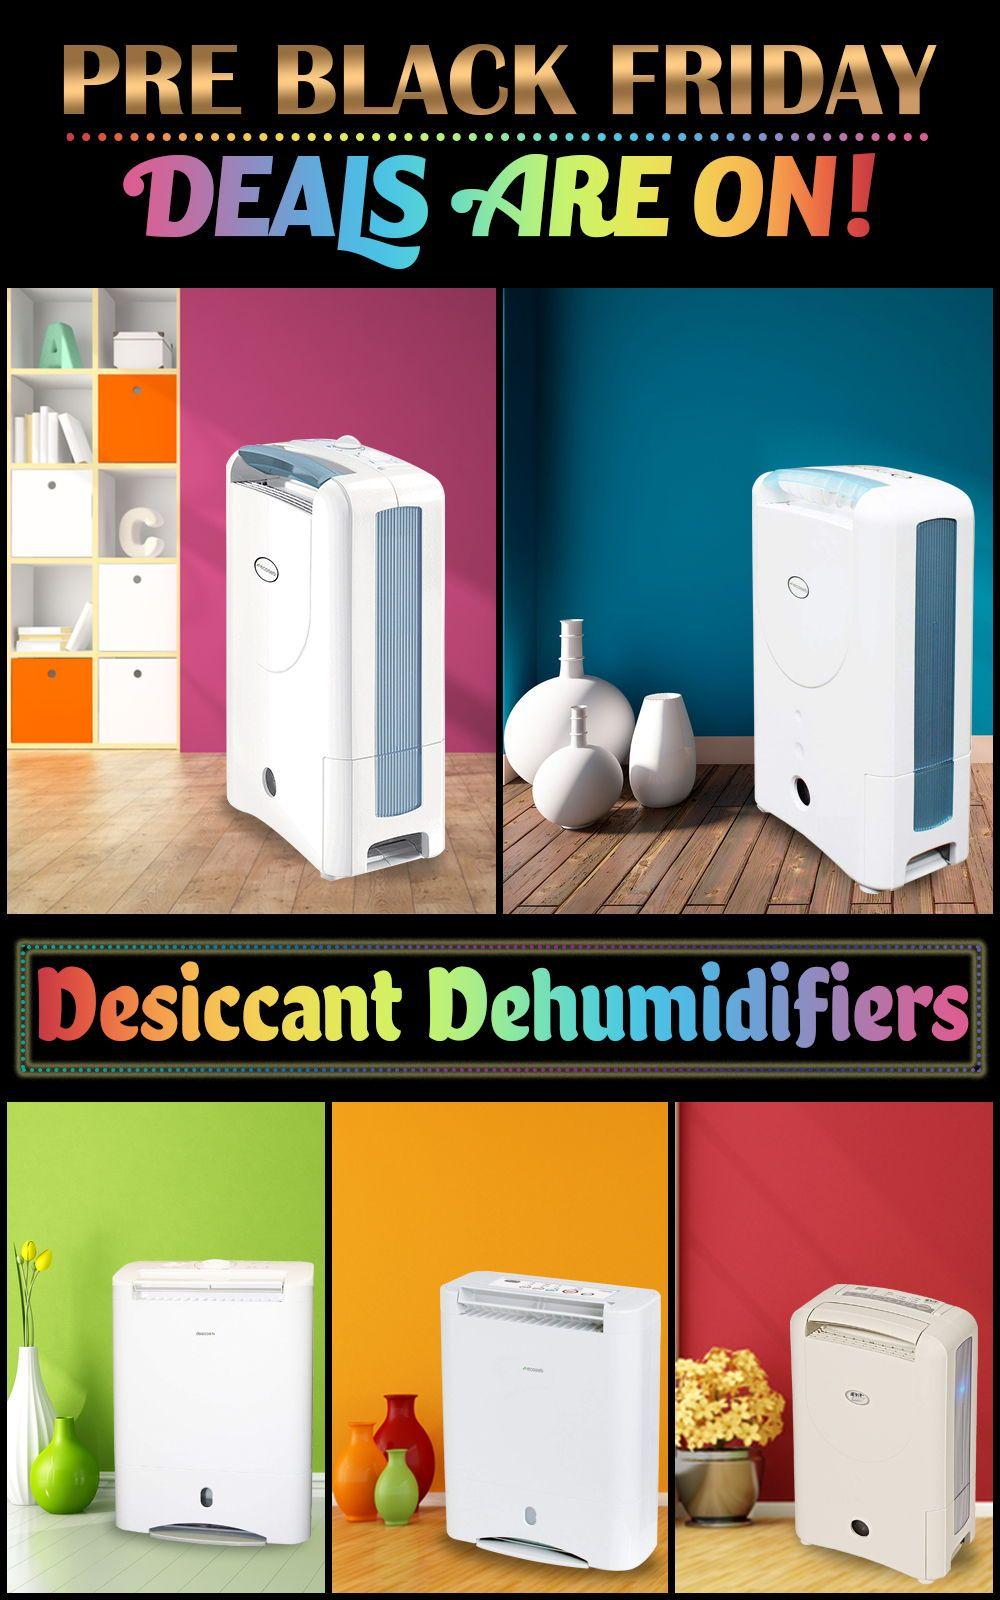 desiccant dehumidifier, best desiccant dehumidifier 2018